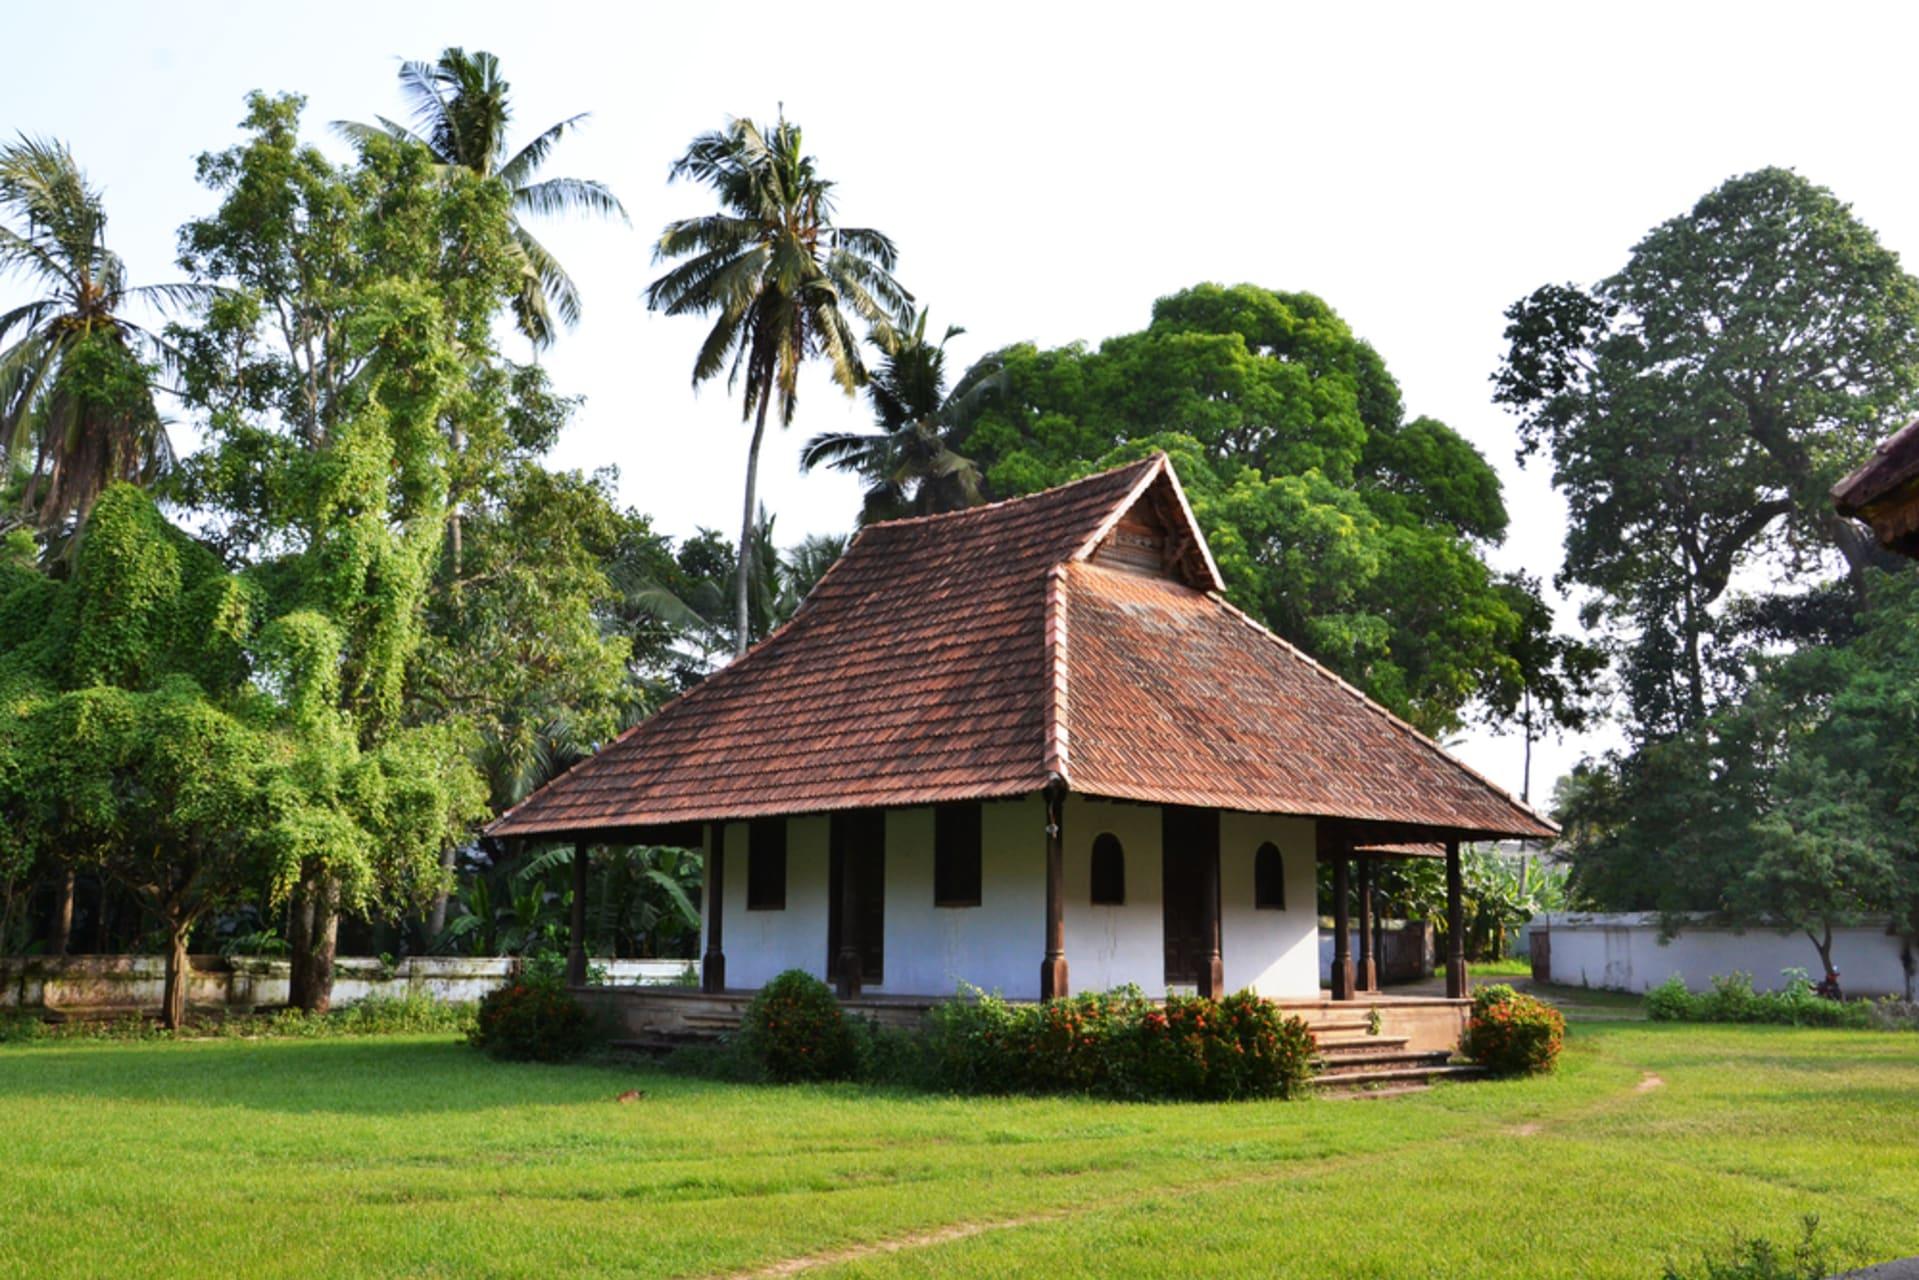 Kerala - Kerala; Daily Village life (Part 3)